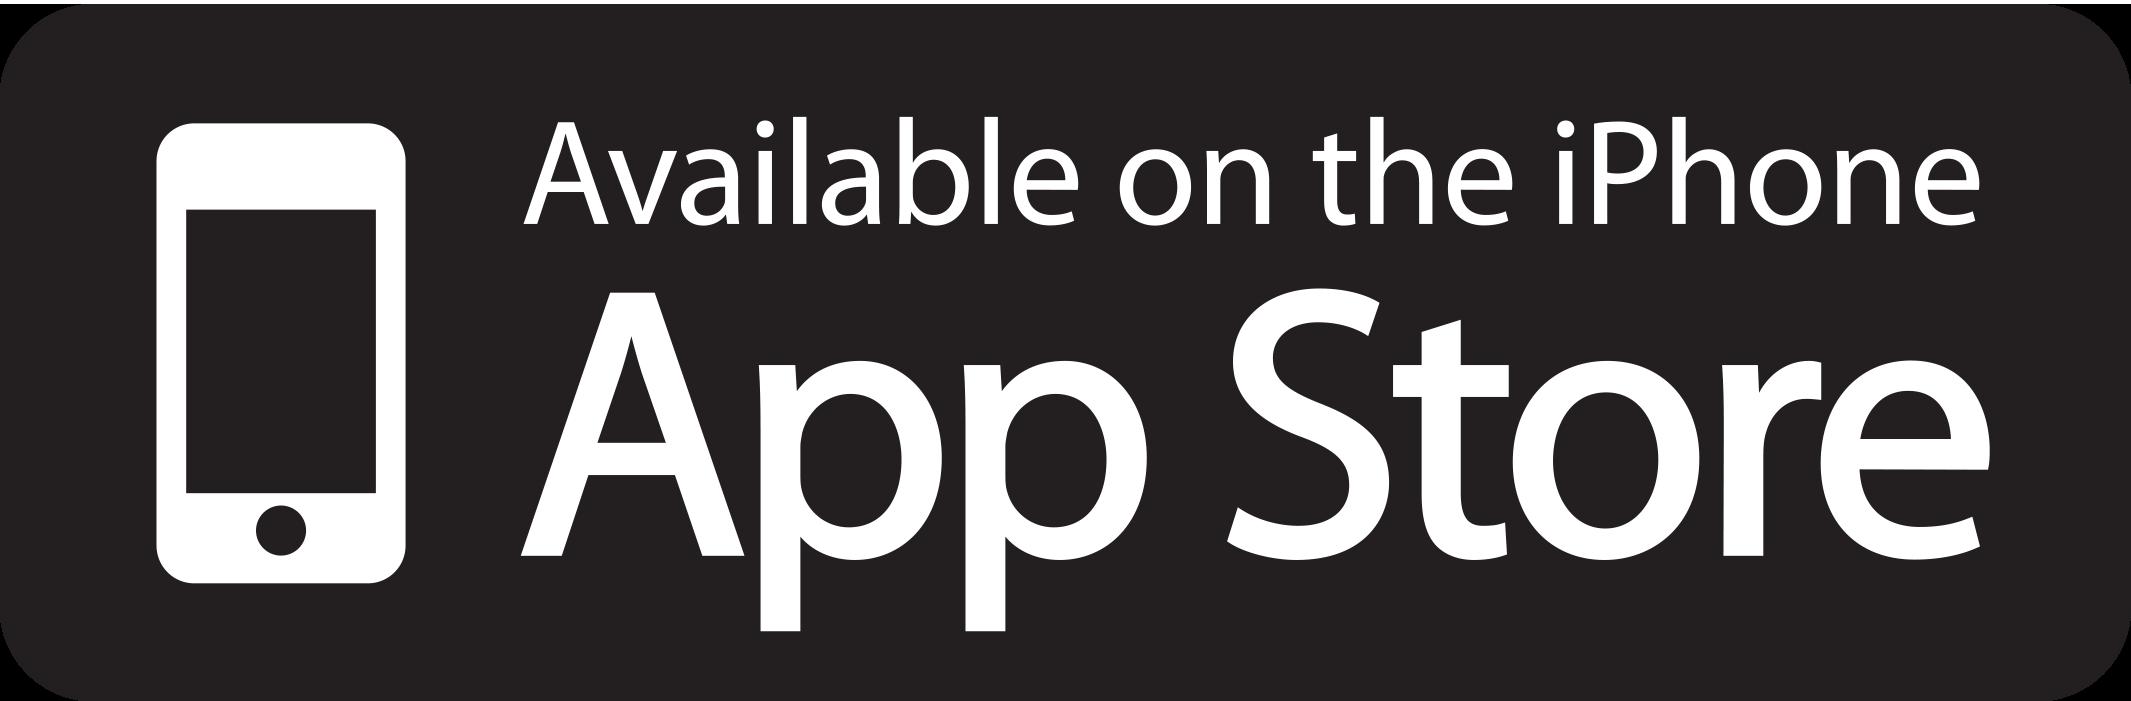 Apple iPhone App Store button